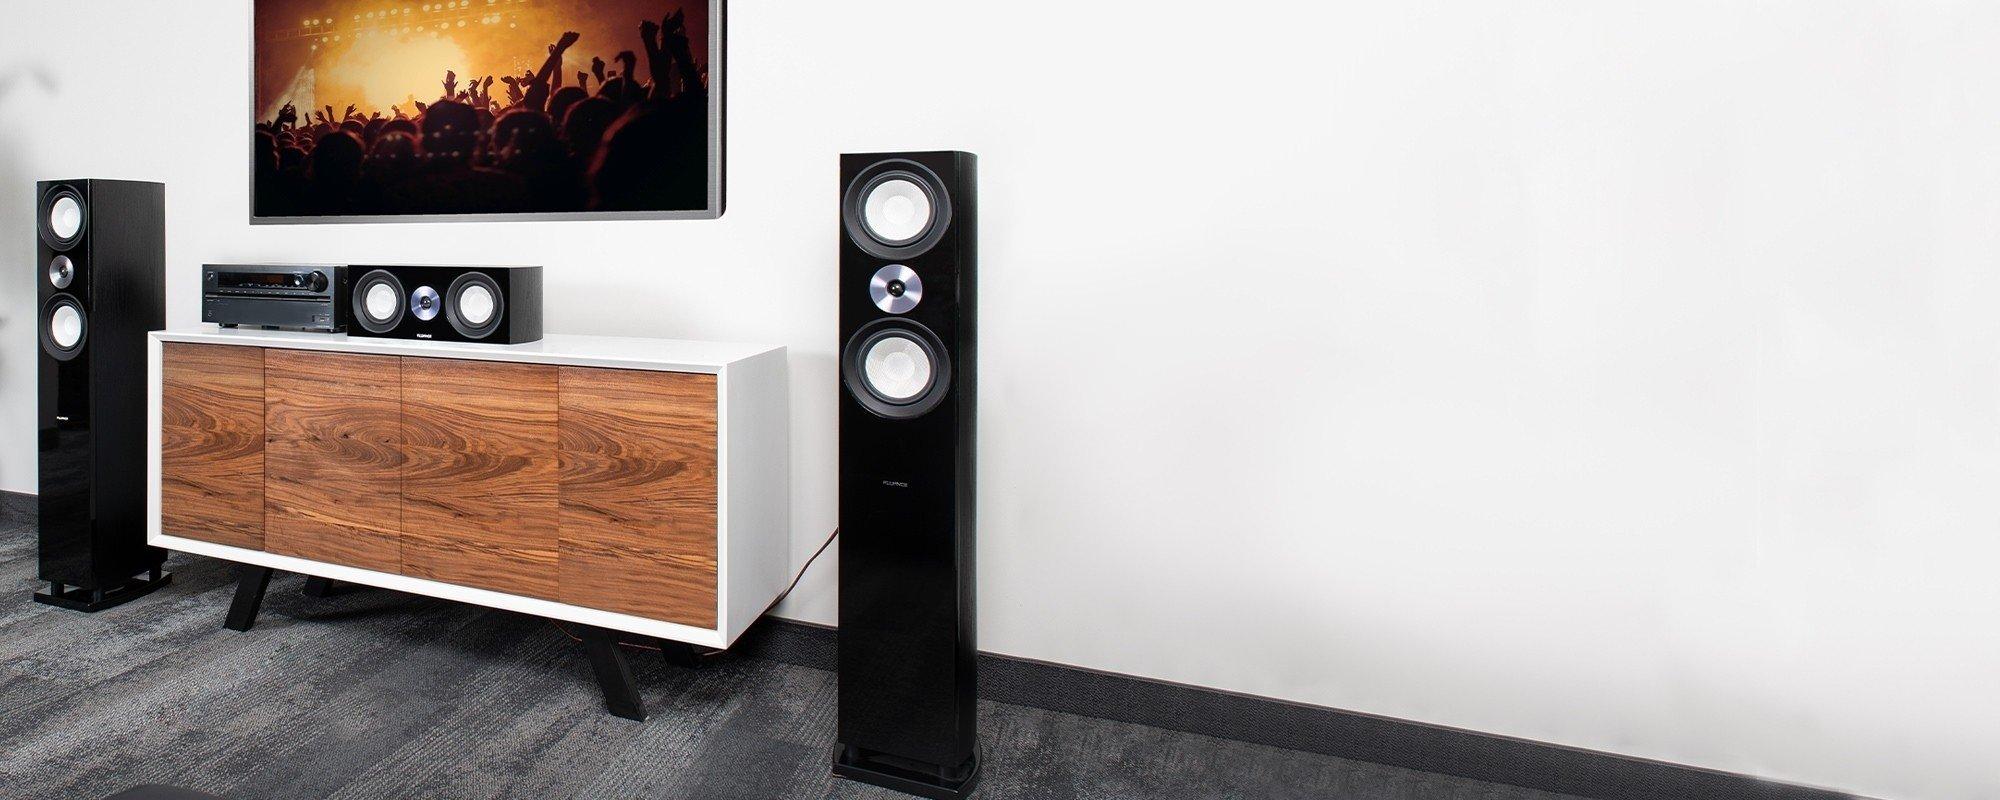 XL8HTB Home Theater Speaker System Setup